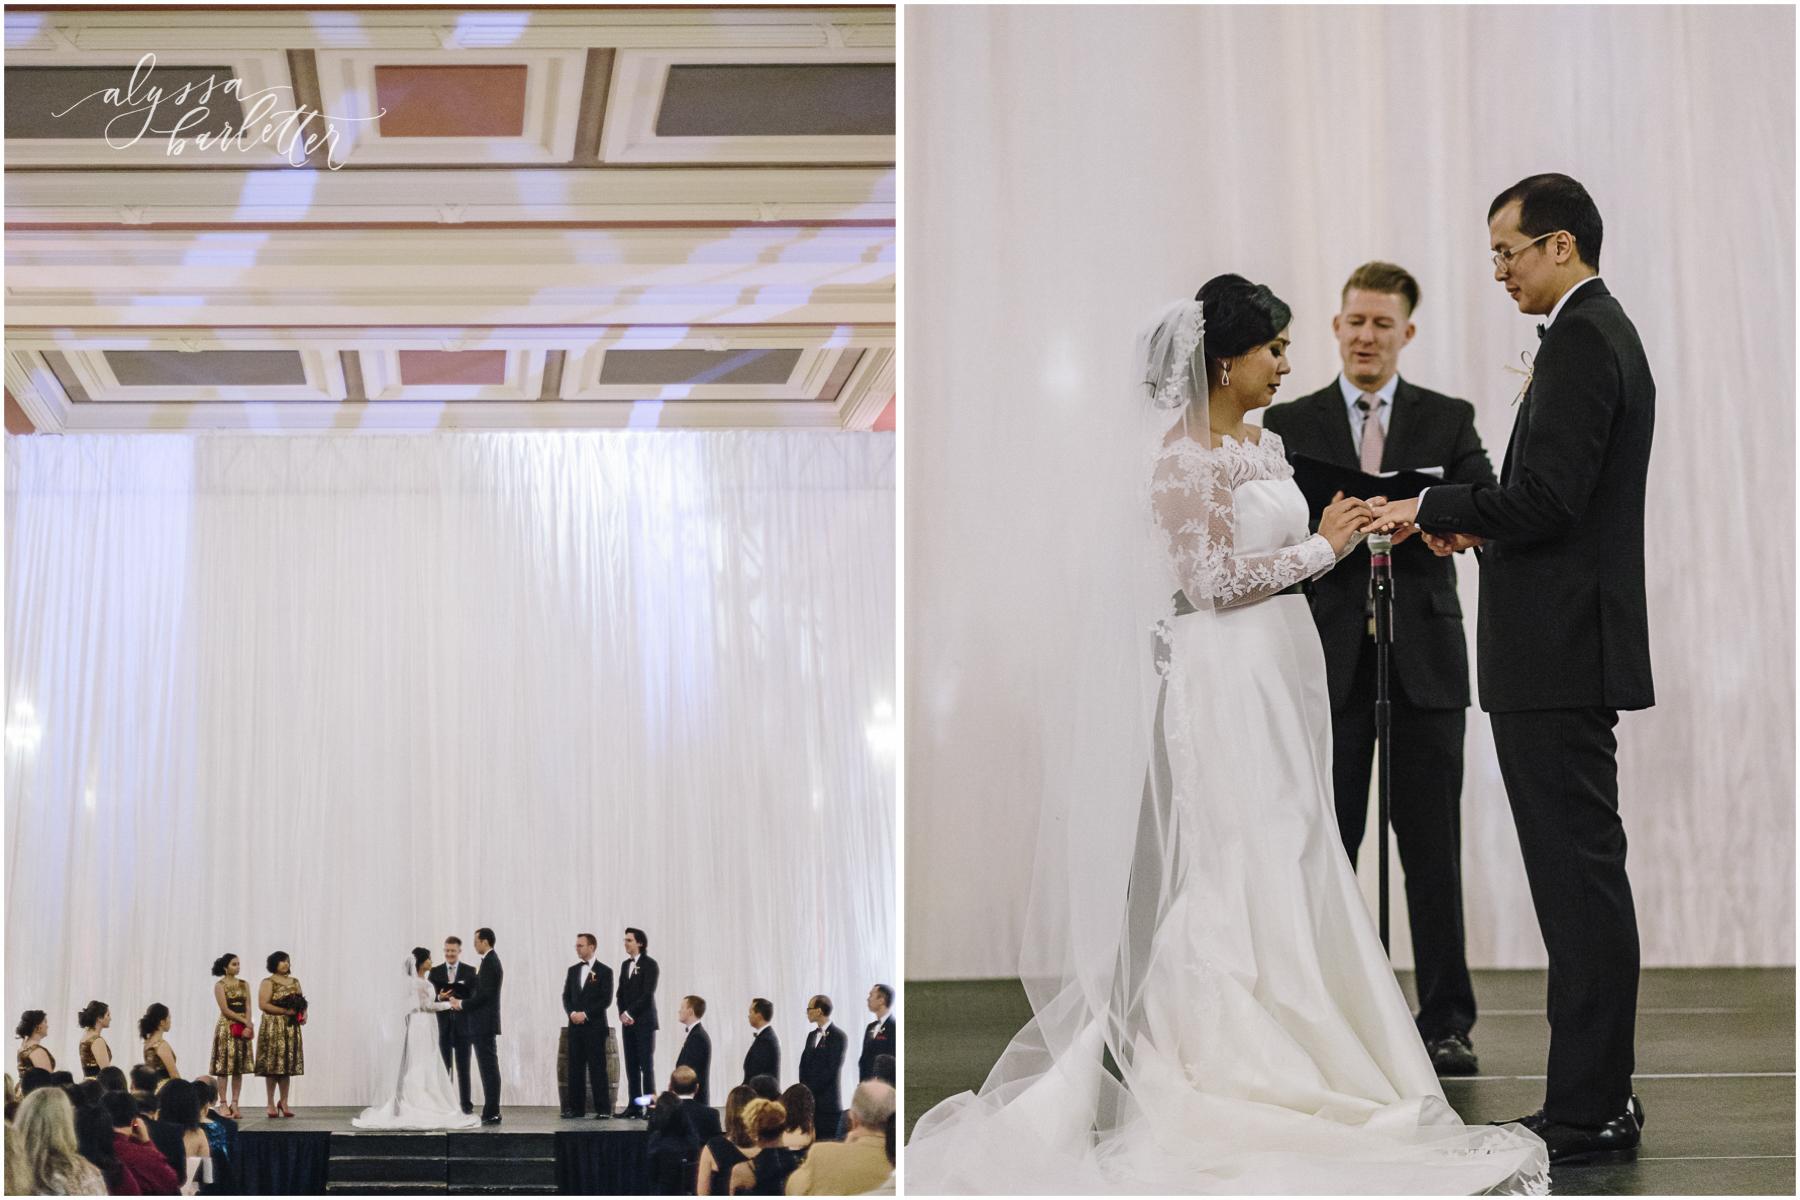 alyssa barletter photography union station wedding photos leopard print winter wedding-1-45.jpg